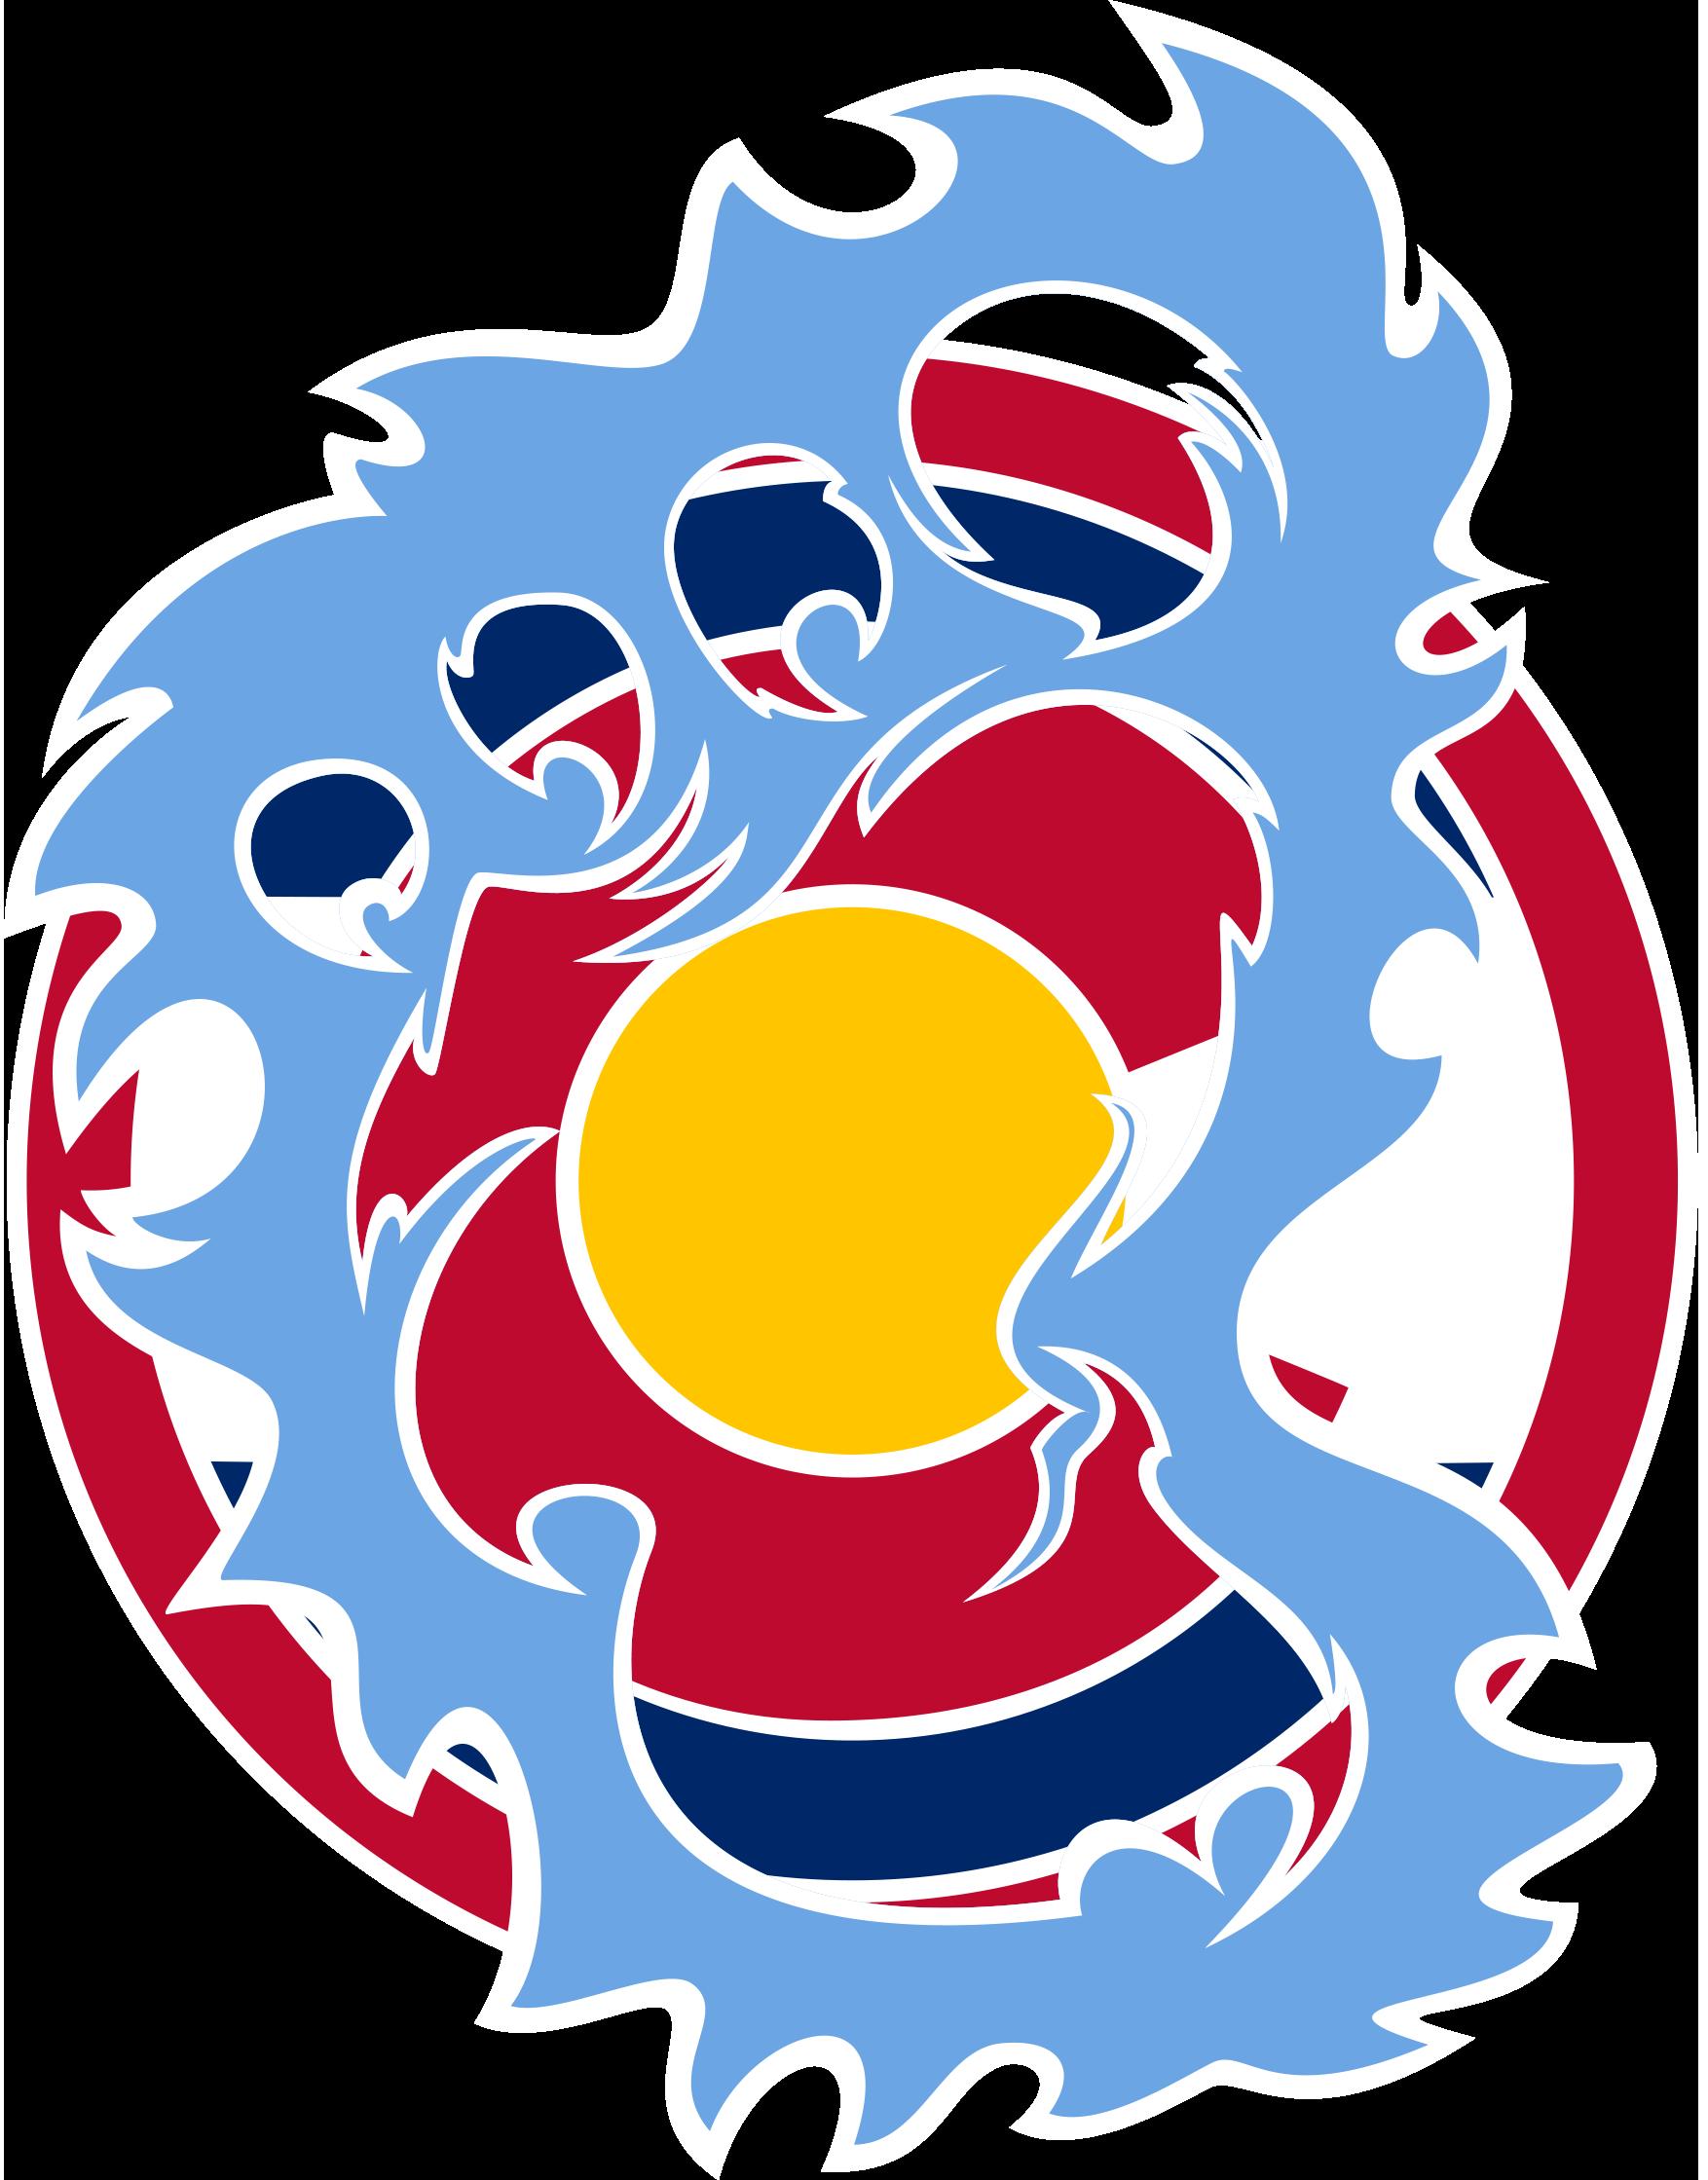 Football yeti clipart jpg freeuse stock Colorado Yeti Spring Teams jpg freeuse stock